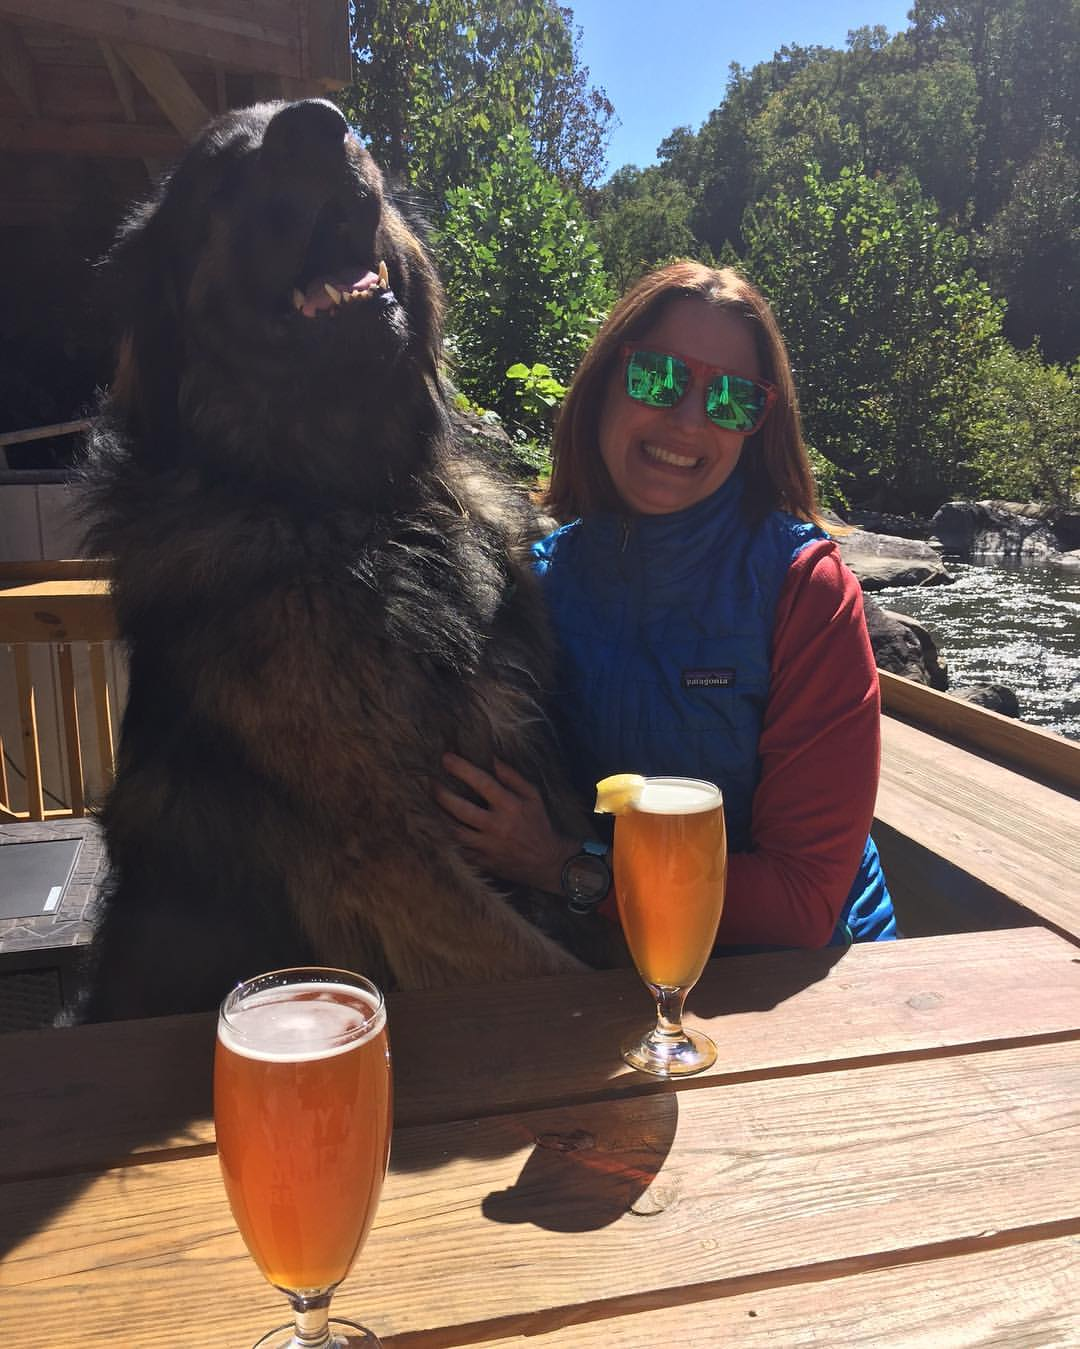 A dogs life in asheville mountain merch img4065 145707958539007980802135460259839508509539o fullsizerender solutioingenieria Choice Image